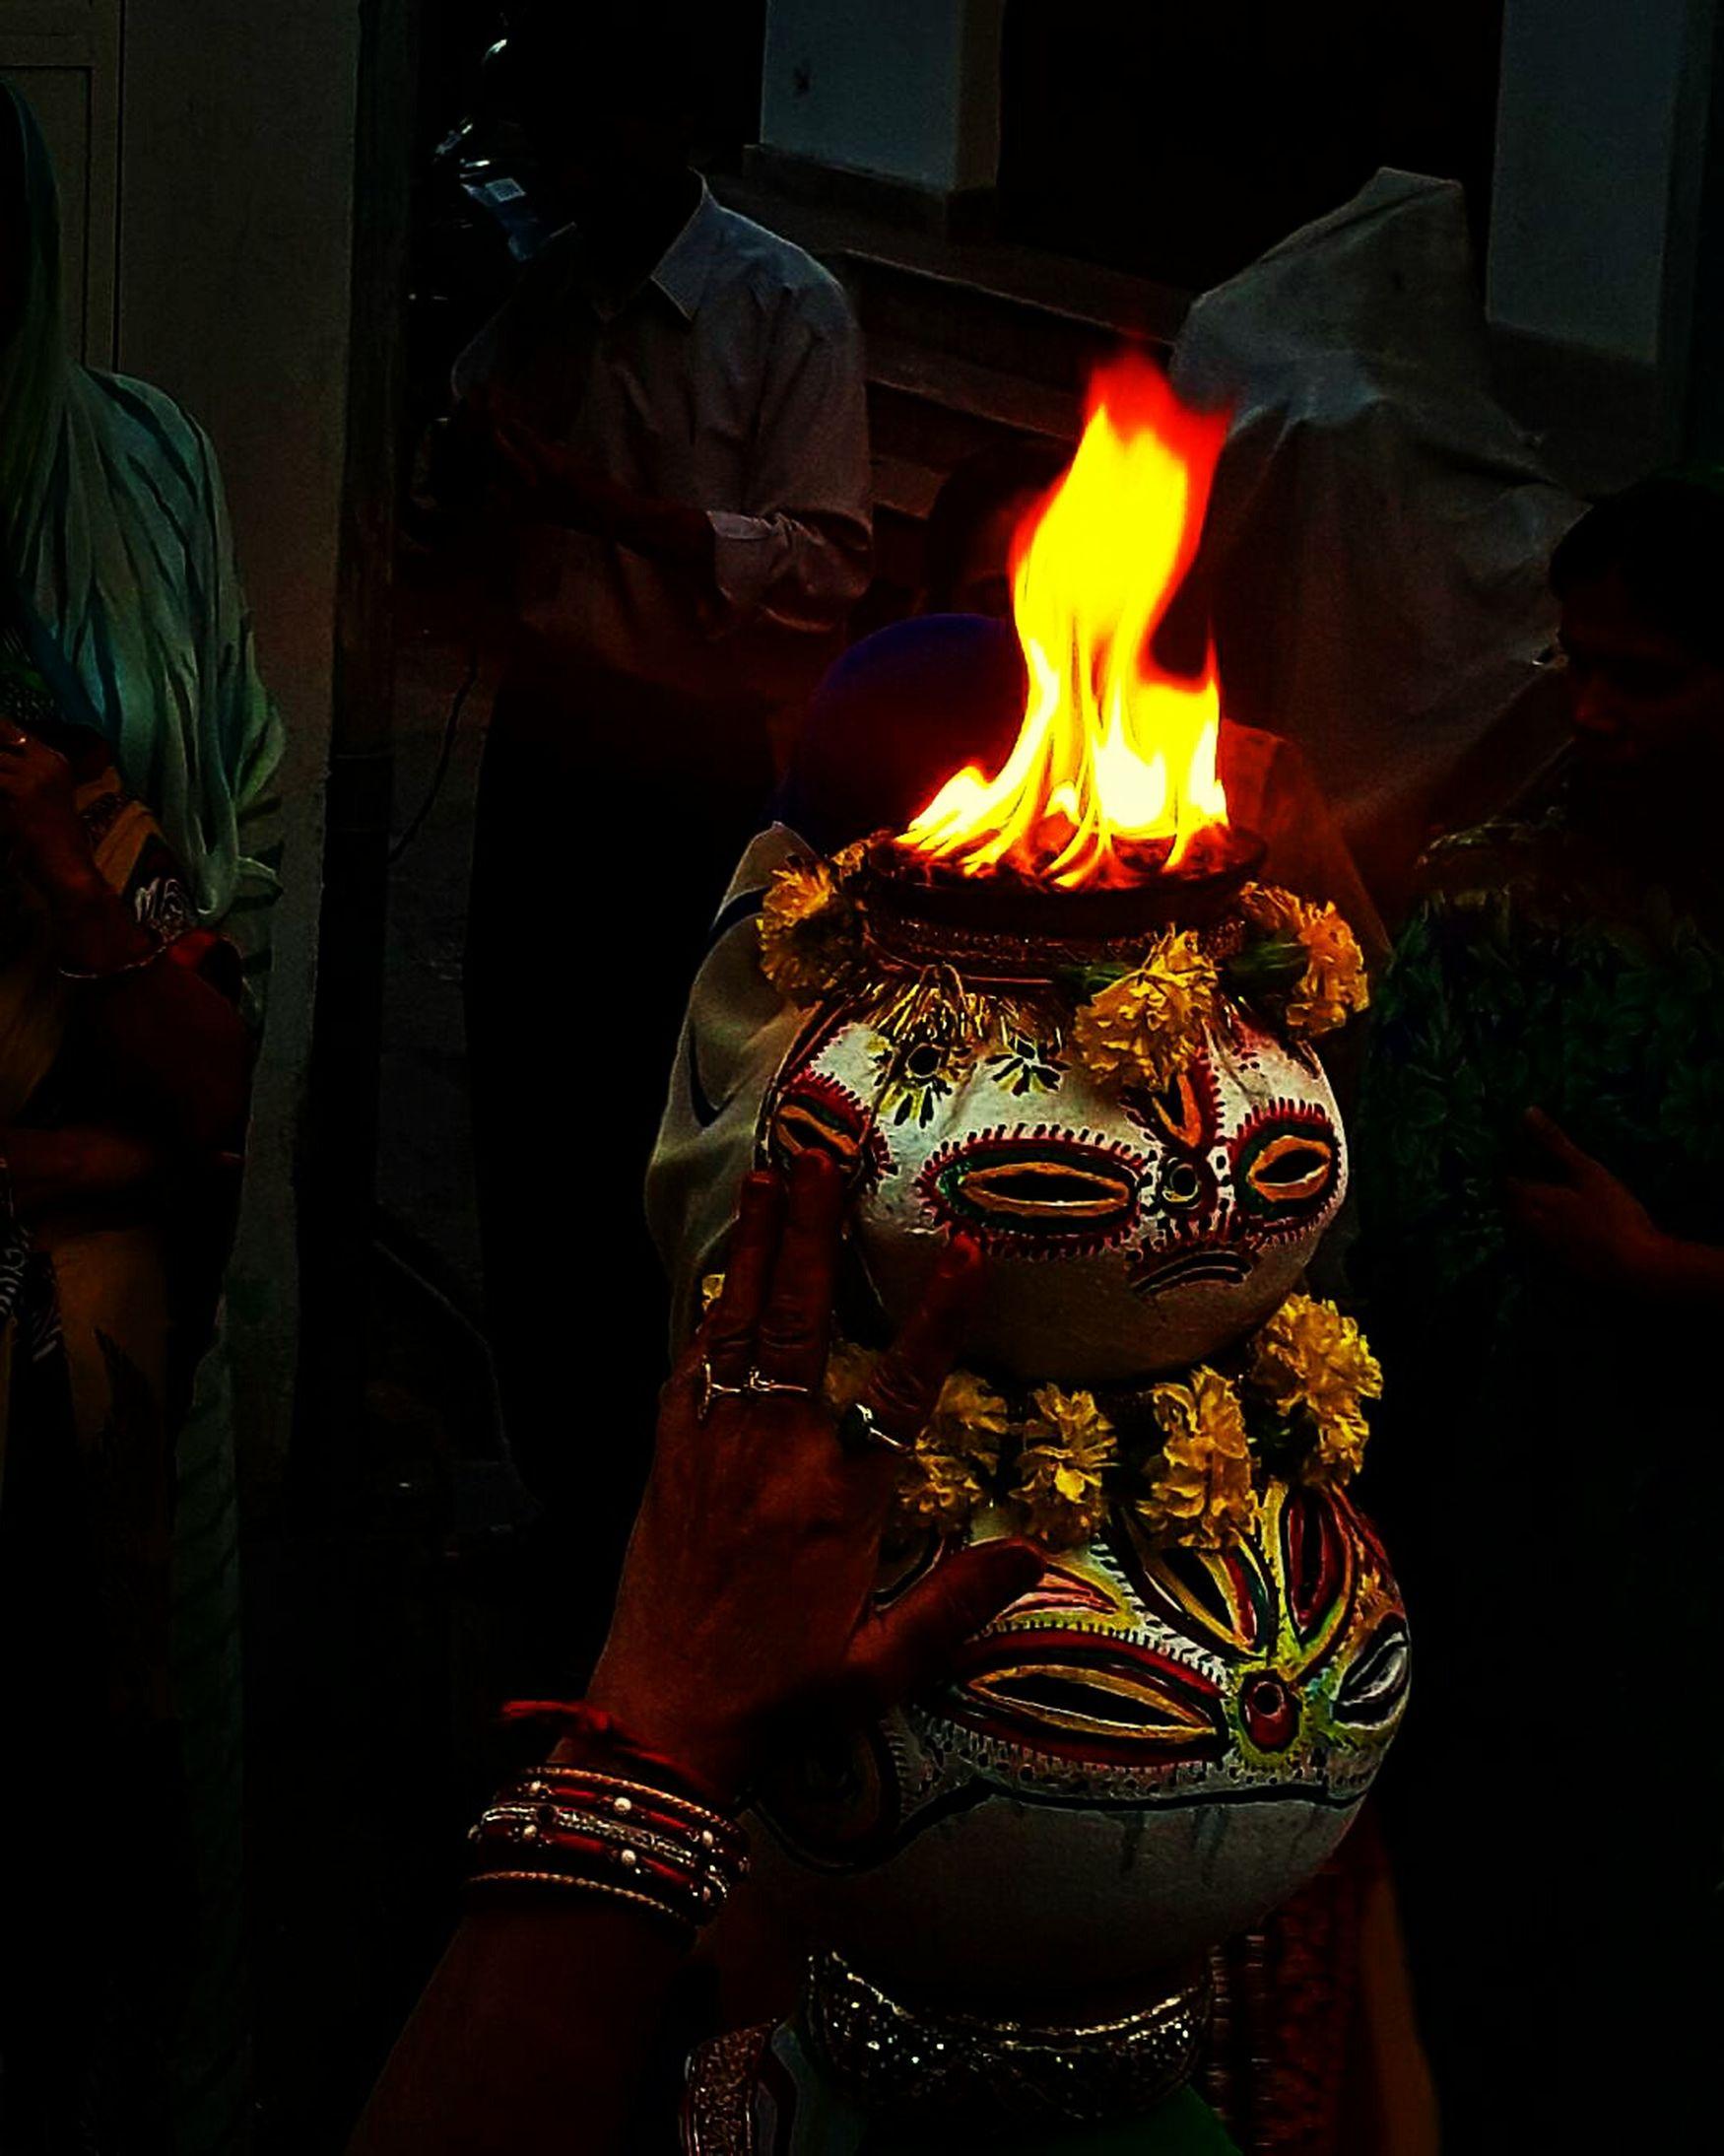 Arts Culture And Entertainment Flame Burning Illuminated Close-up My Point Of View MyClick Aarti Agani Kalash Like Likeforlike likeforlike #likemyphoto #qlikemyphotos #like4like #likemypic #likeback #ilikeback #10likes #50likes #100likes 20likes likere Likeforlikealways